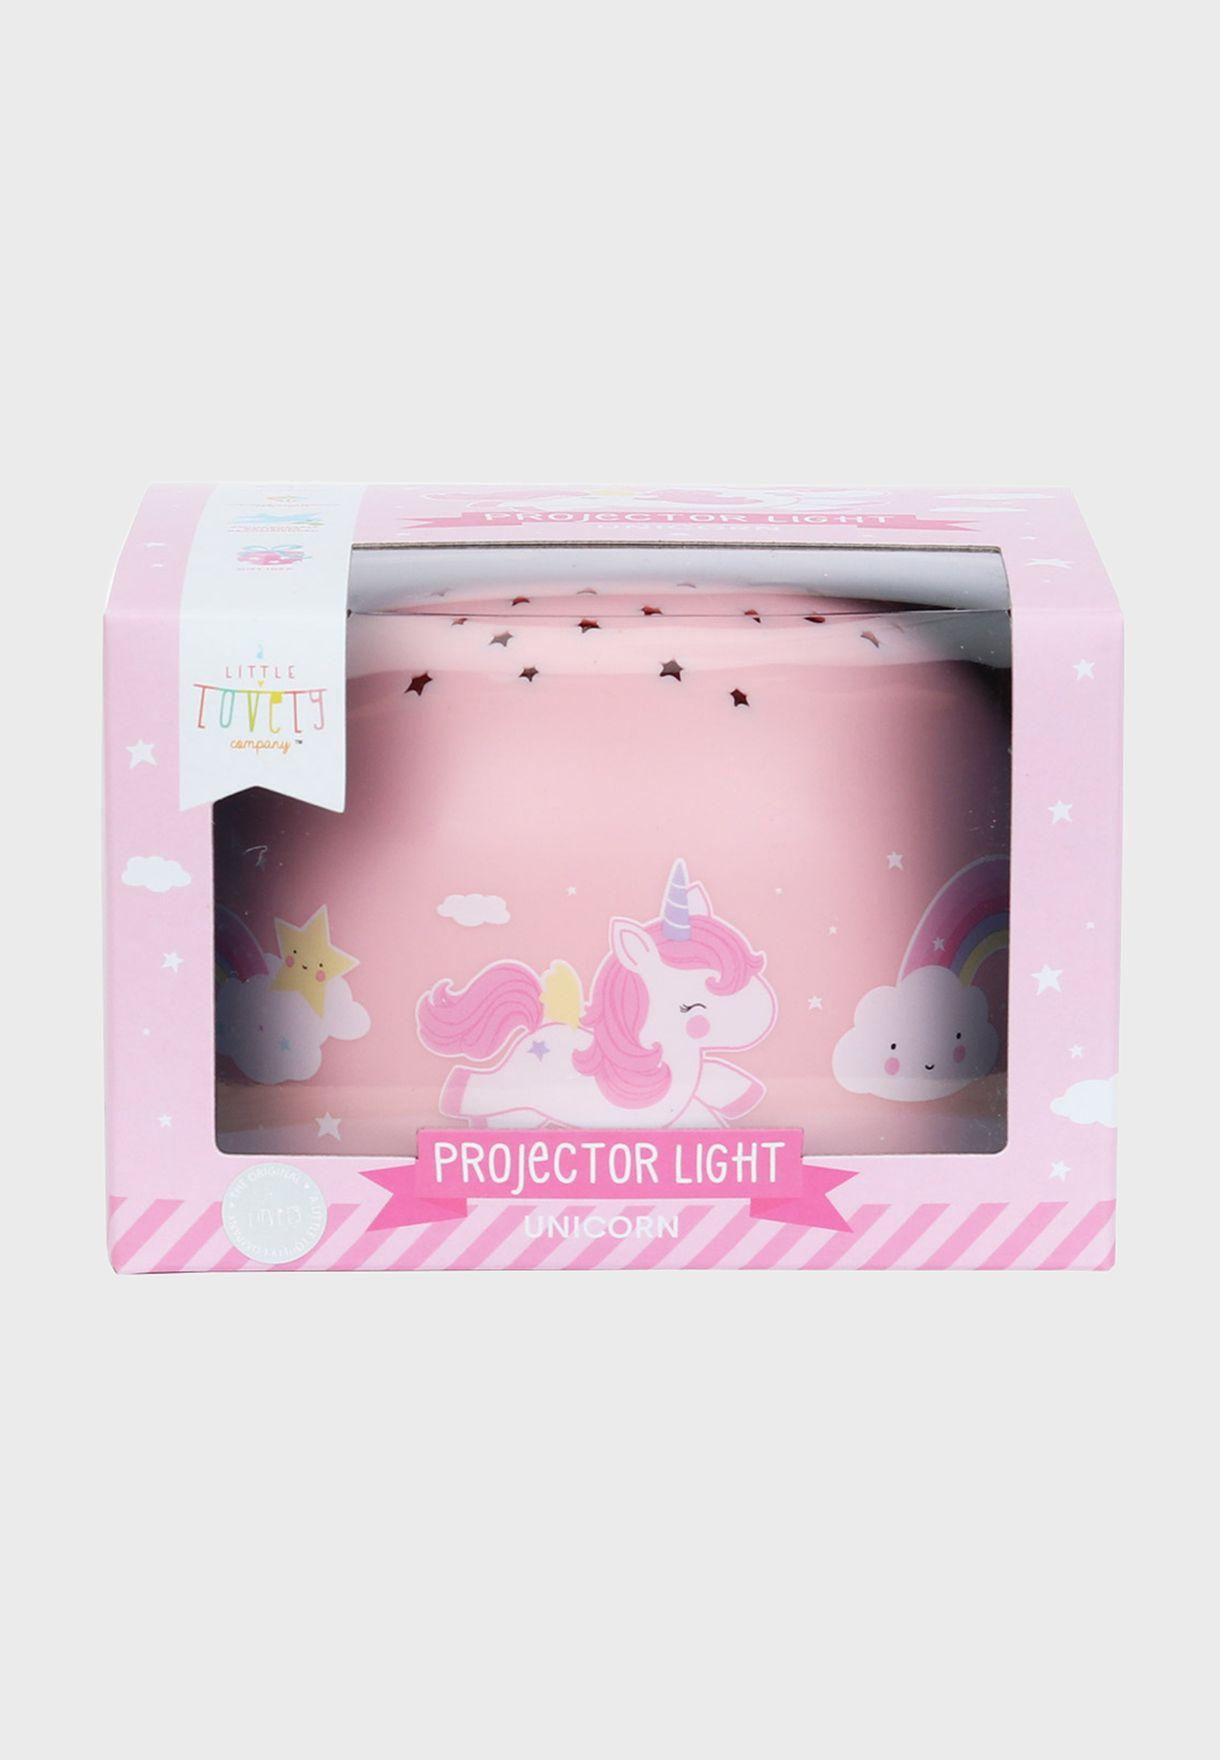 Projector Light Unicorn